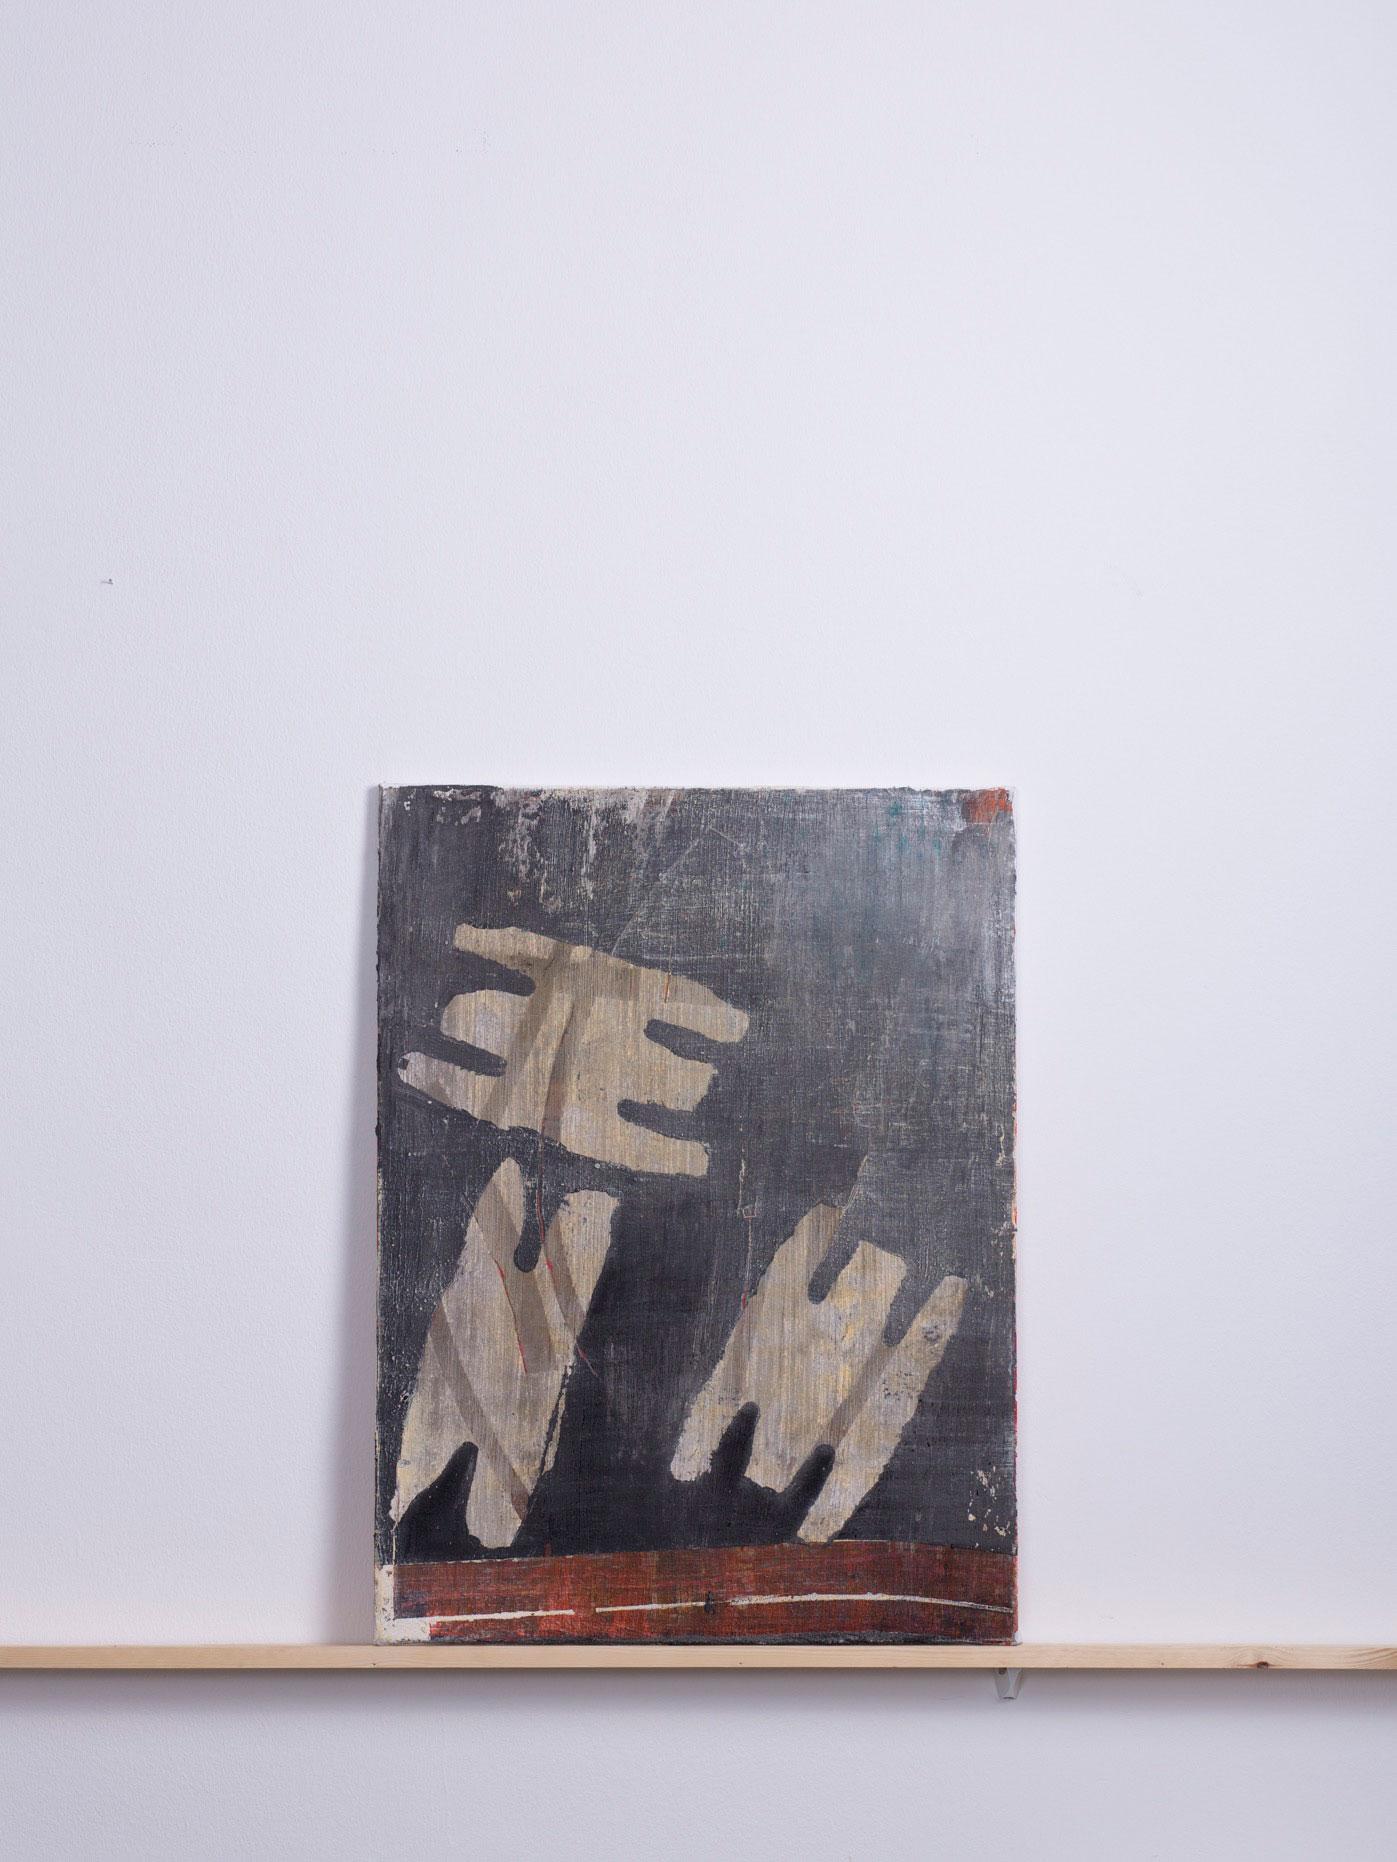 NEENI, 2014 - 60x80 cm, <br>Acryl und Sand auf Leinwand